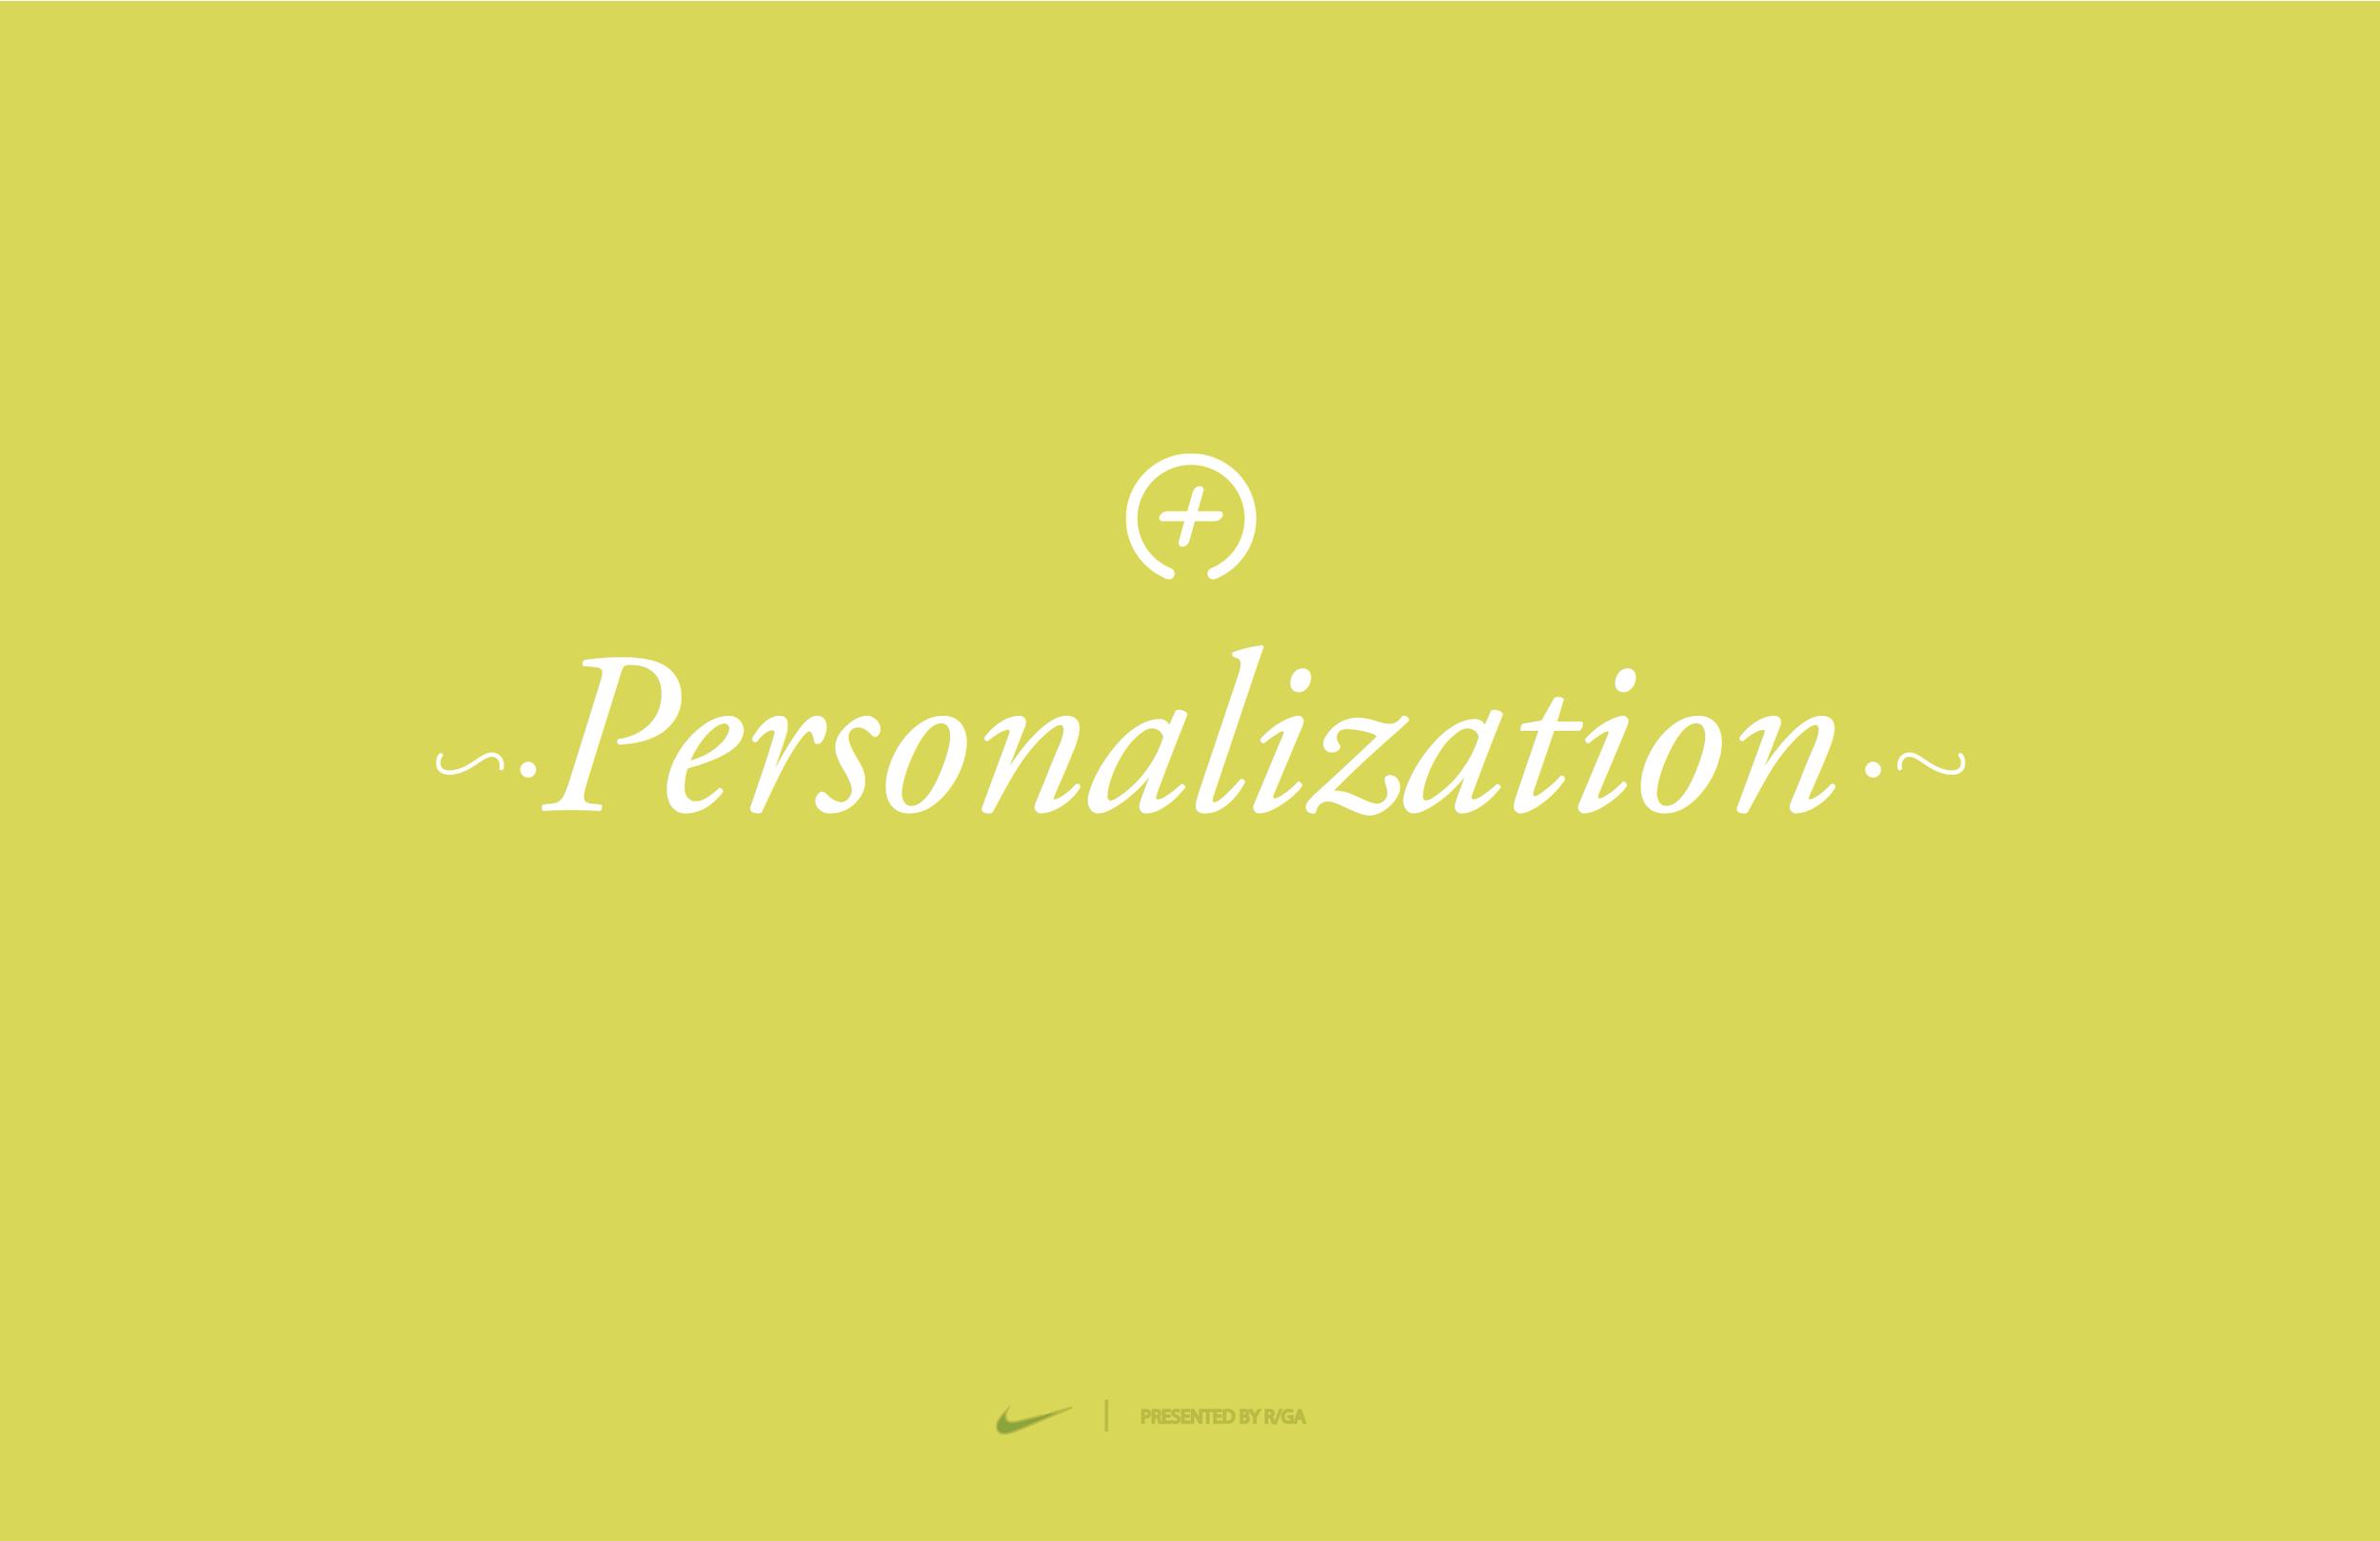 OneNikeApp_Personalization_Title.png